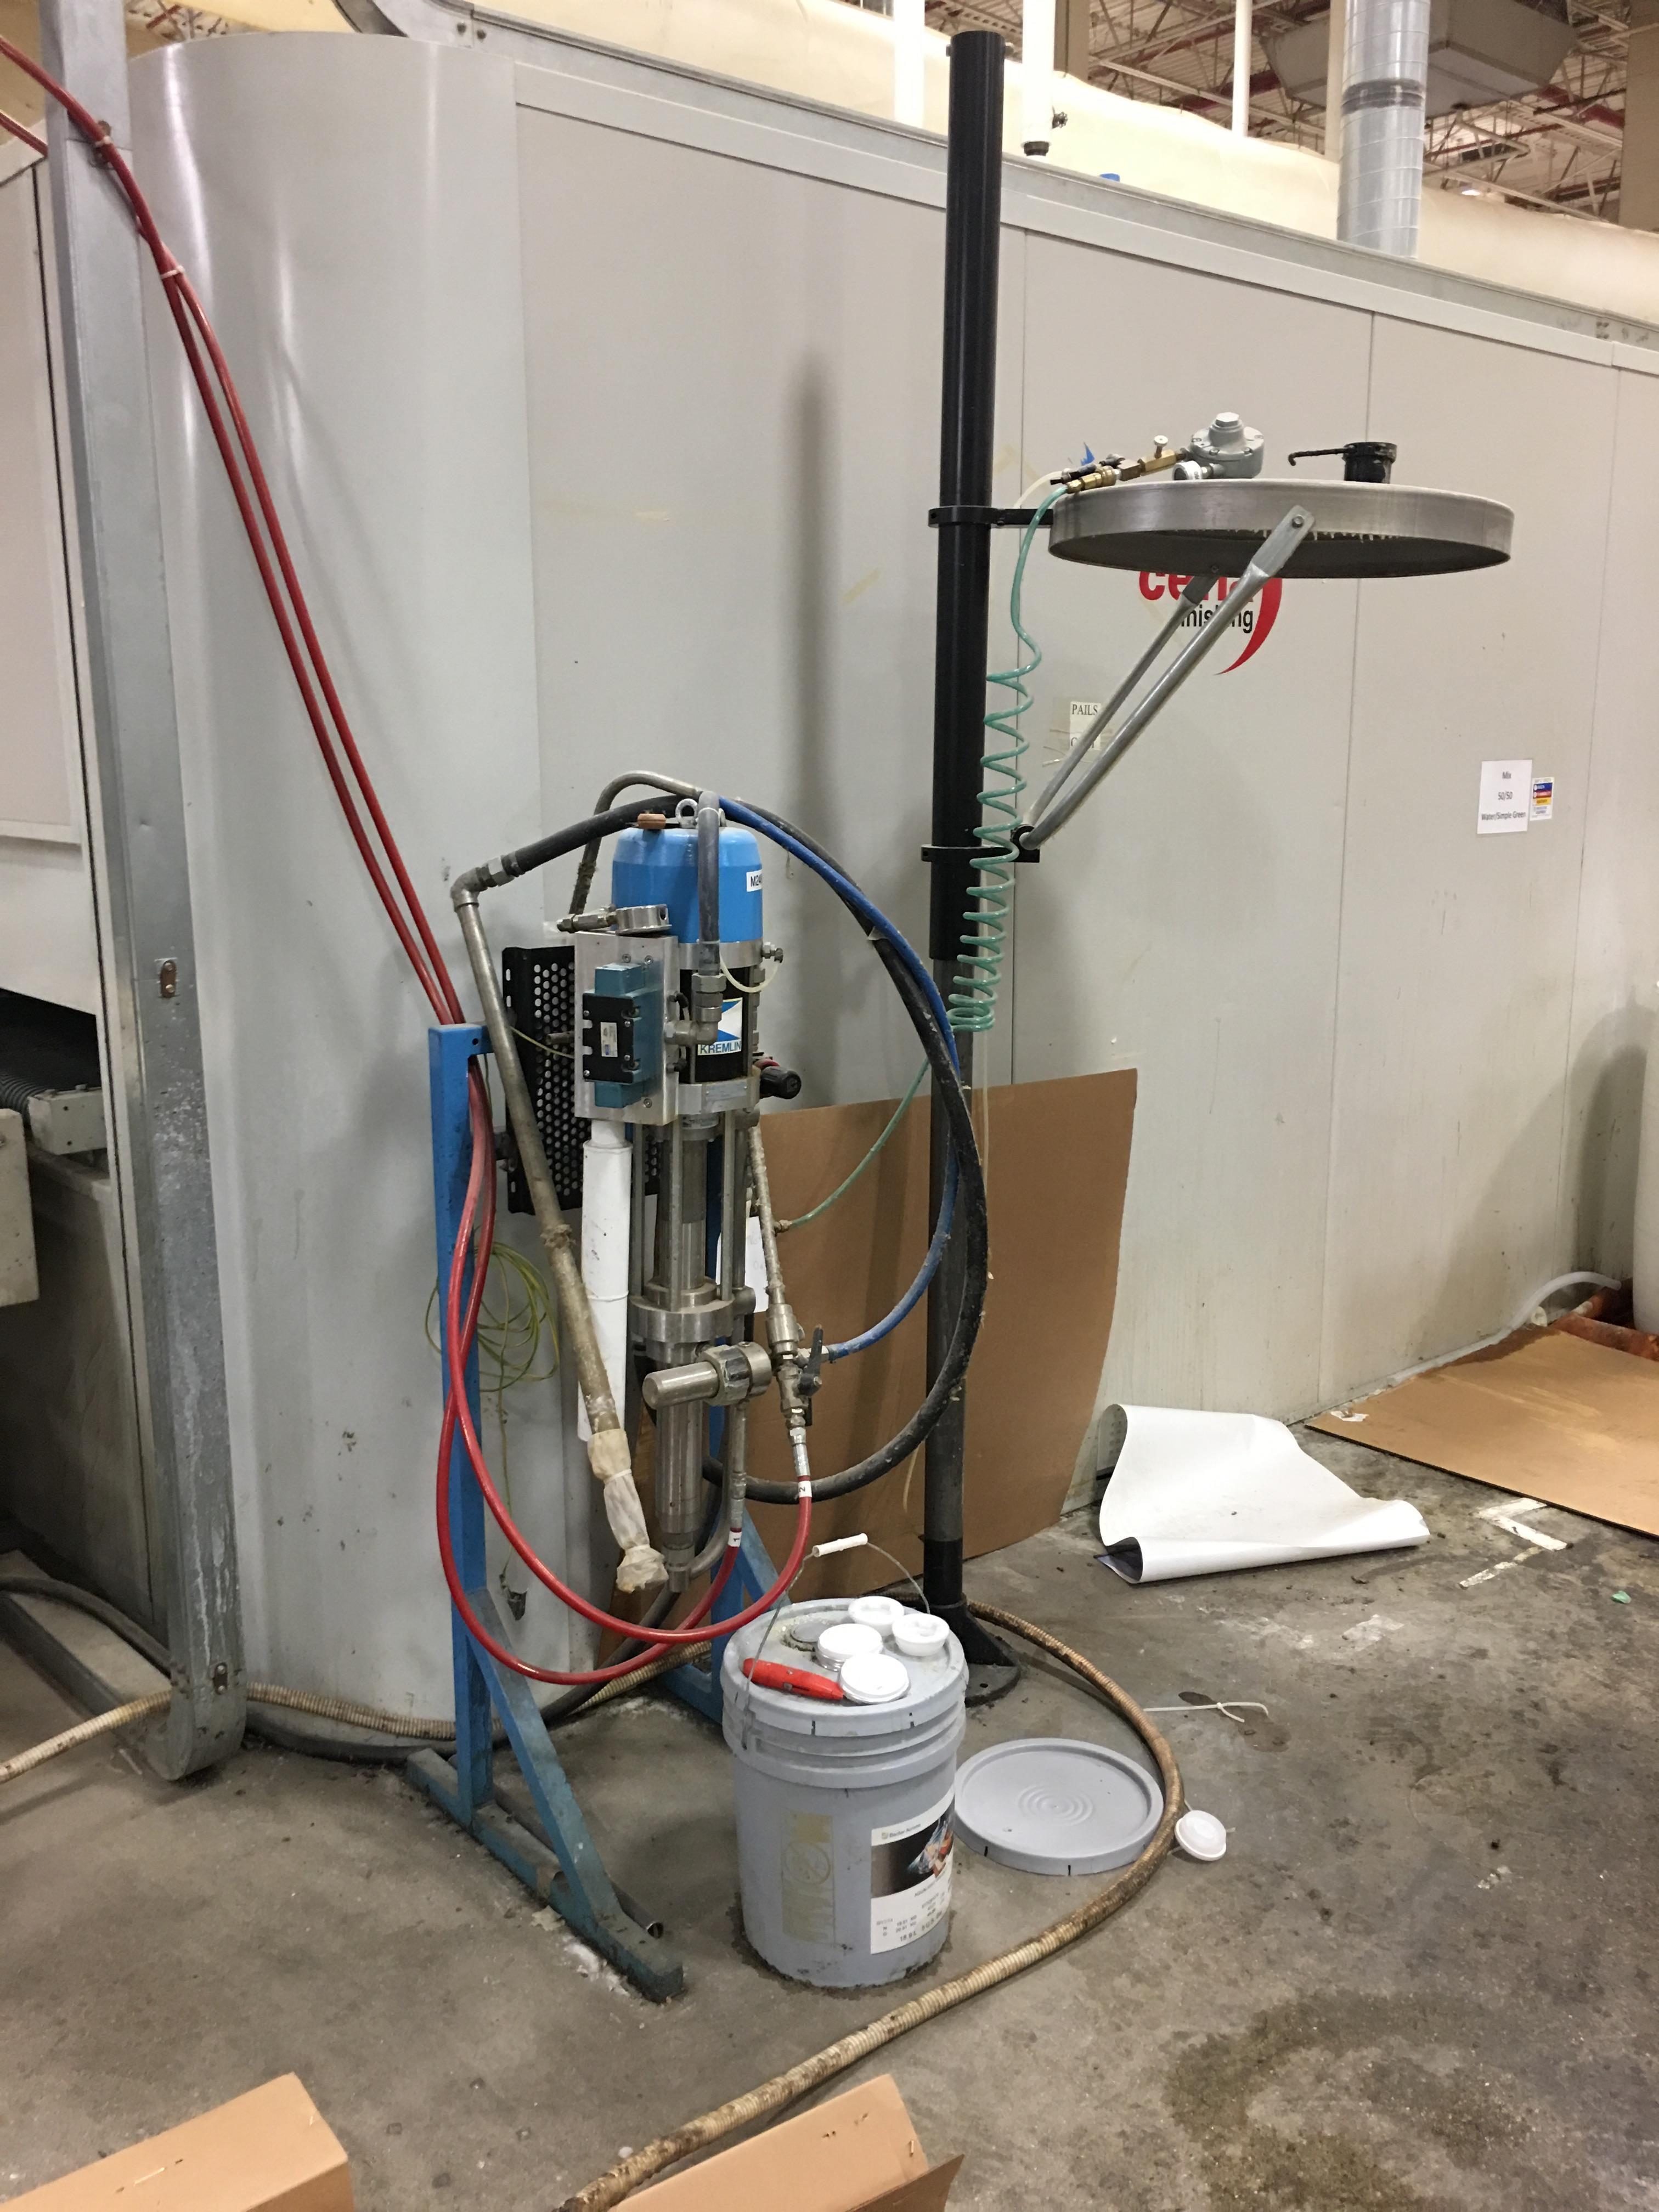 Lot 12b - Lot of 3 Spray Pumps